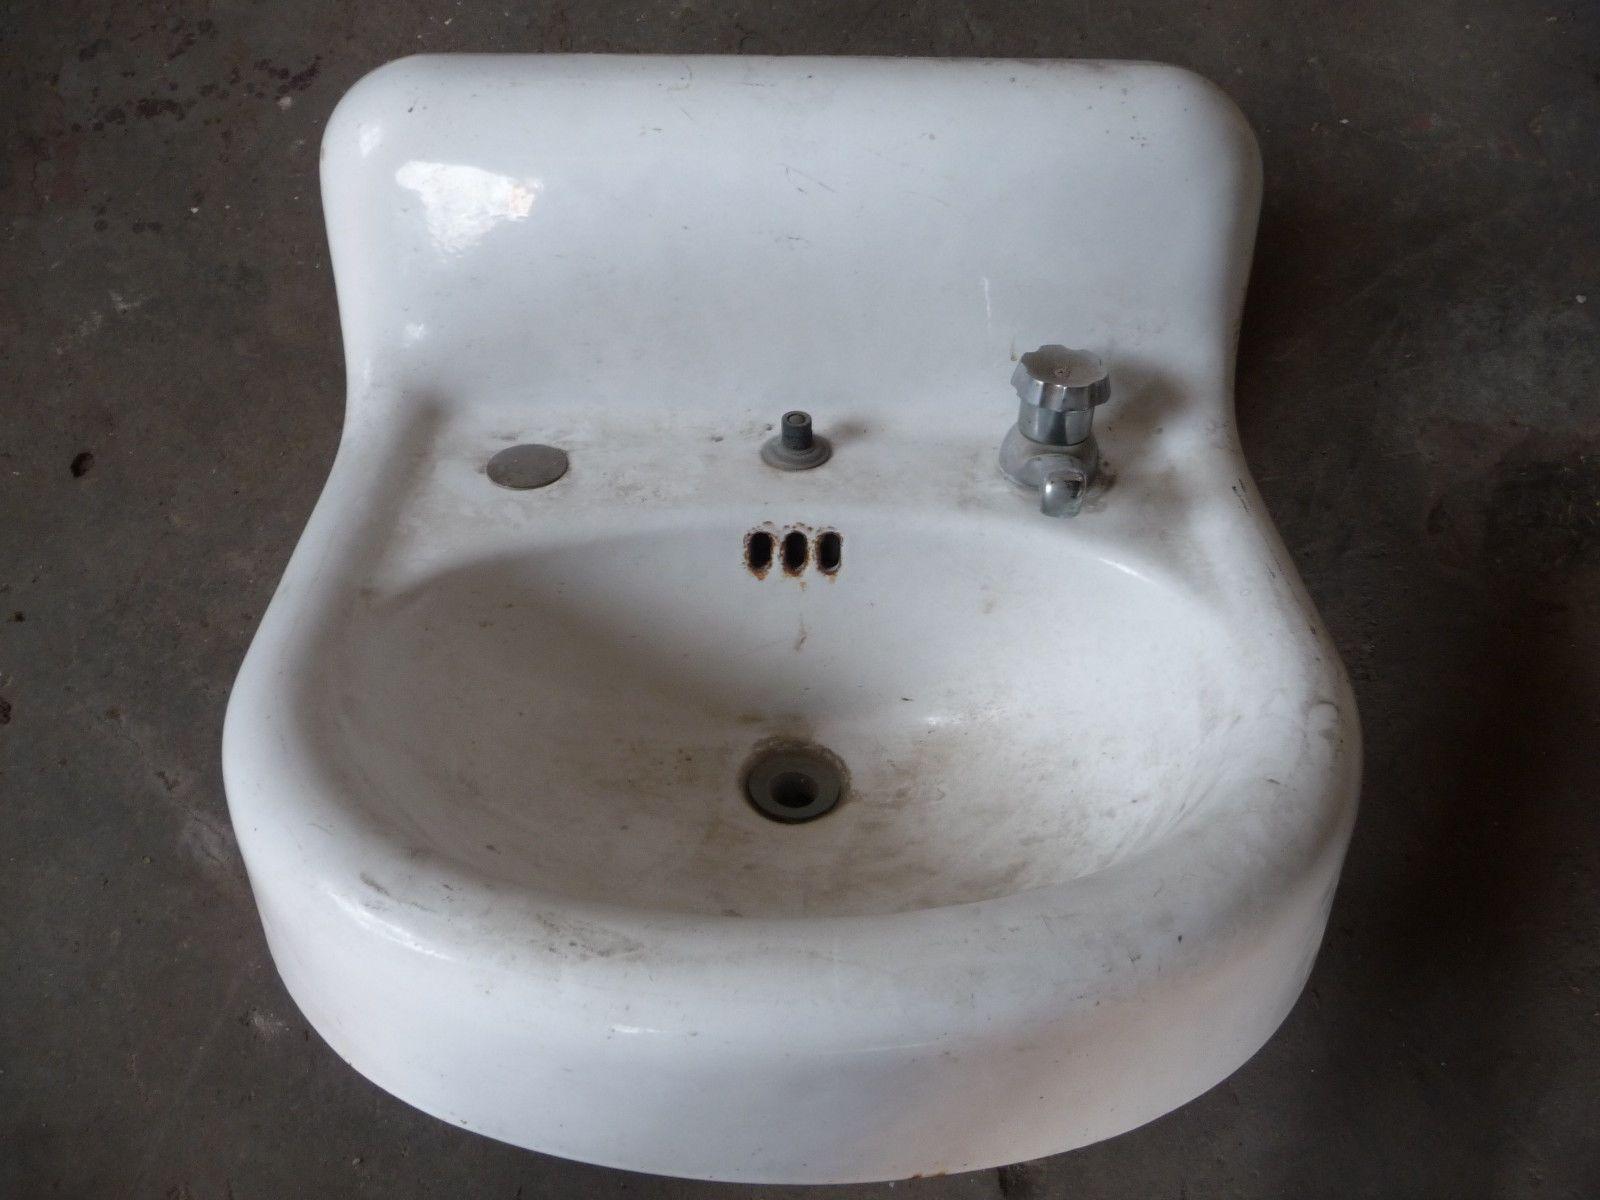 Antique Victorian Bathroom Lavatory Sink - Circa 1905 Architectural ...